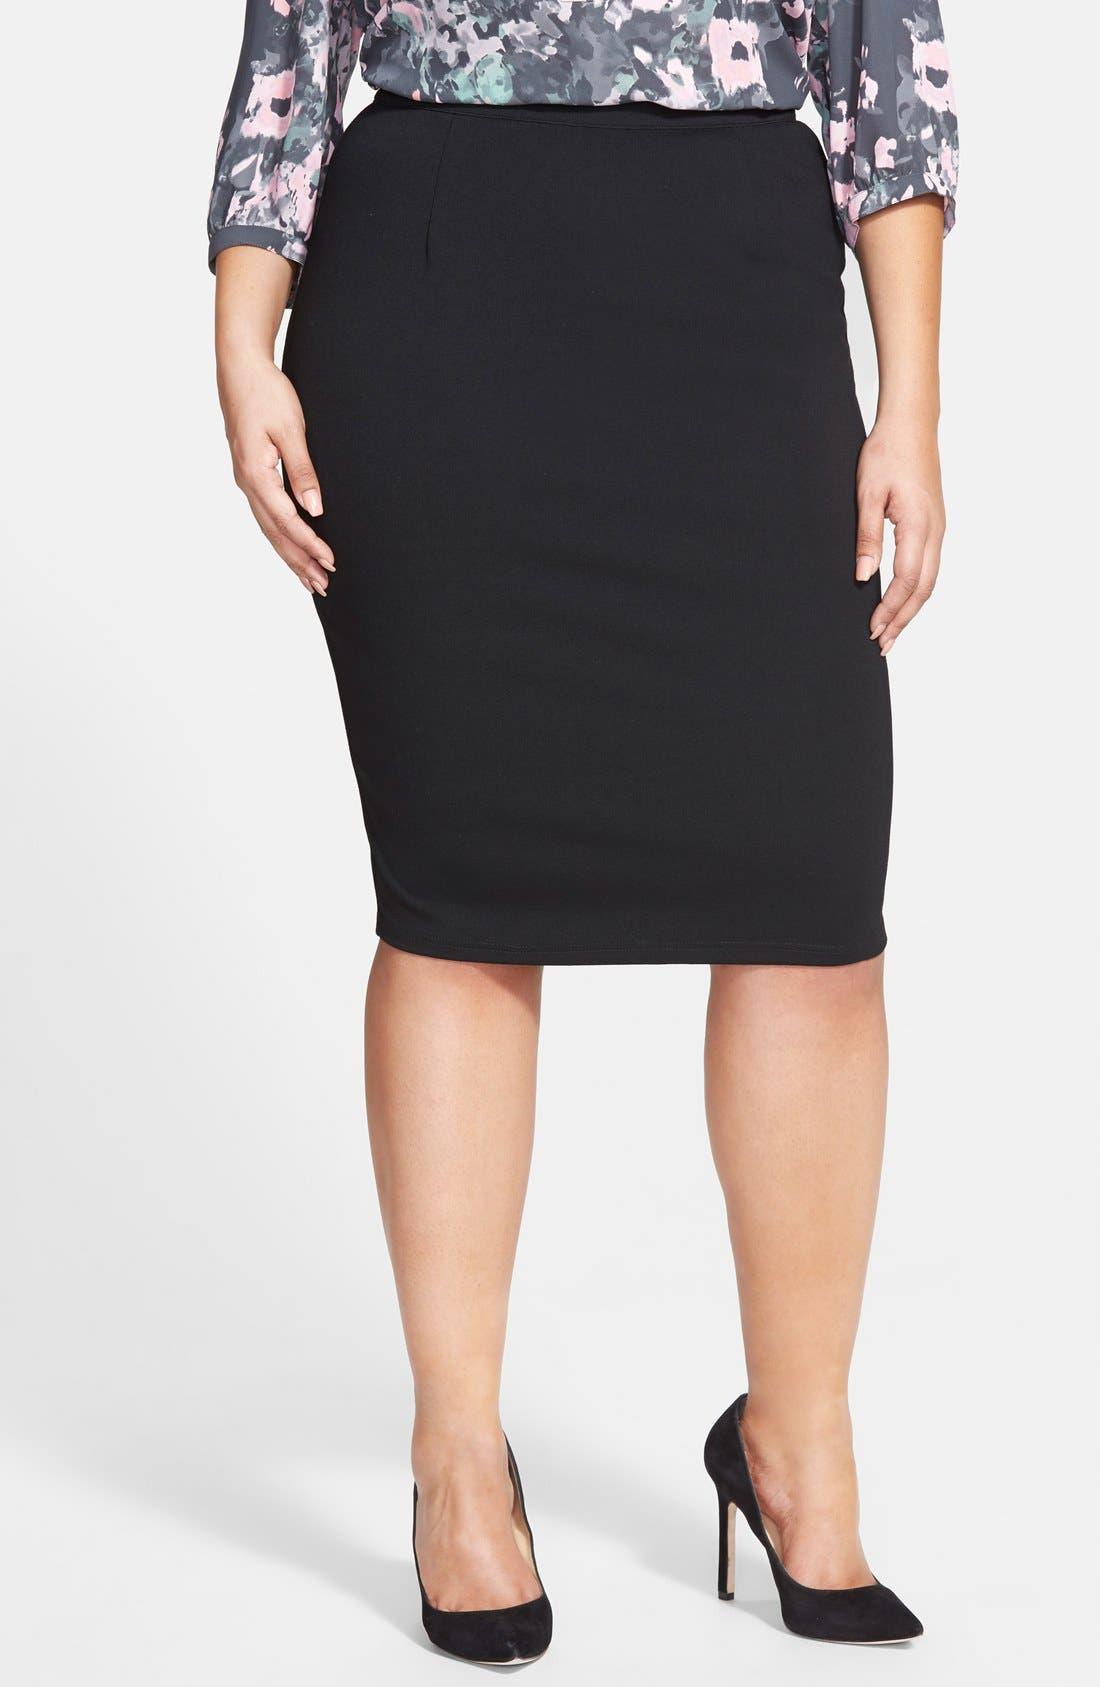 CITY CHIC, Back Zip Tube Skirt, Main thumbnail 1, color, BLACK